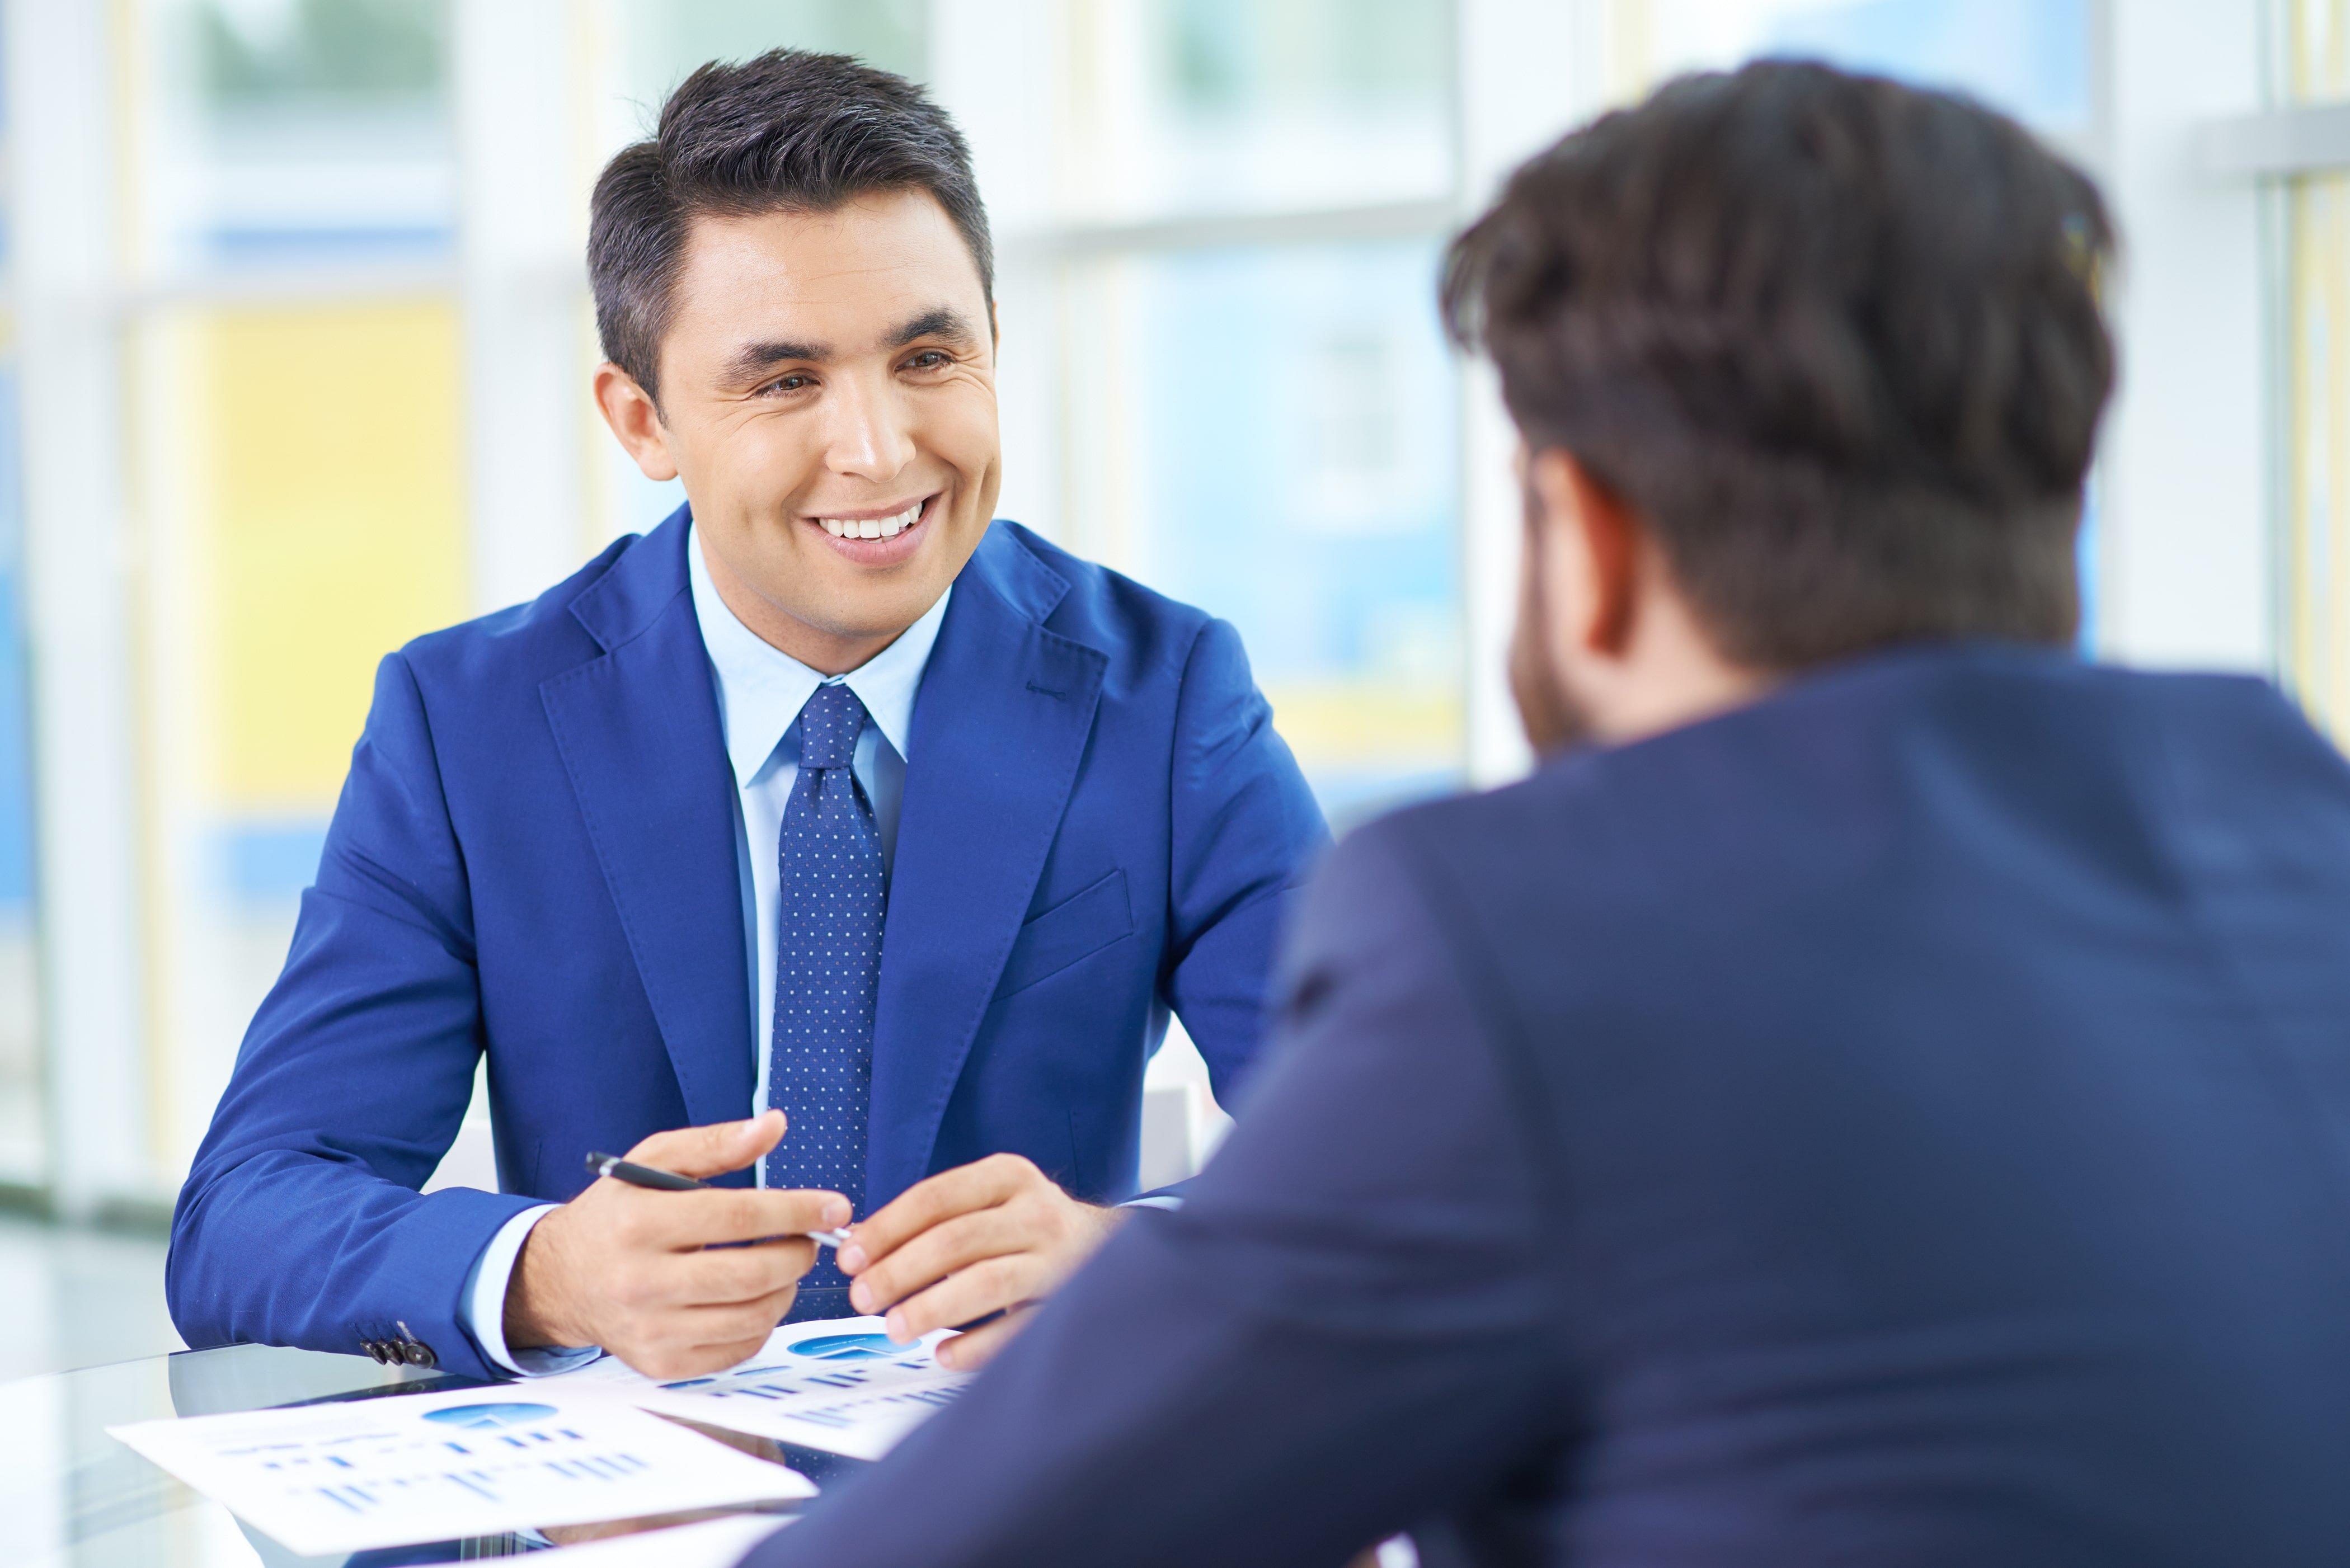 twee-mooie-zakenmannen-gesprek